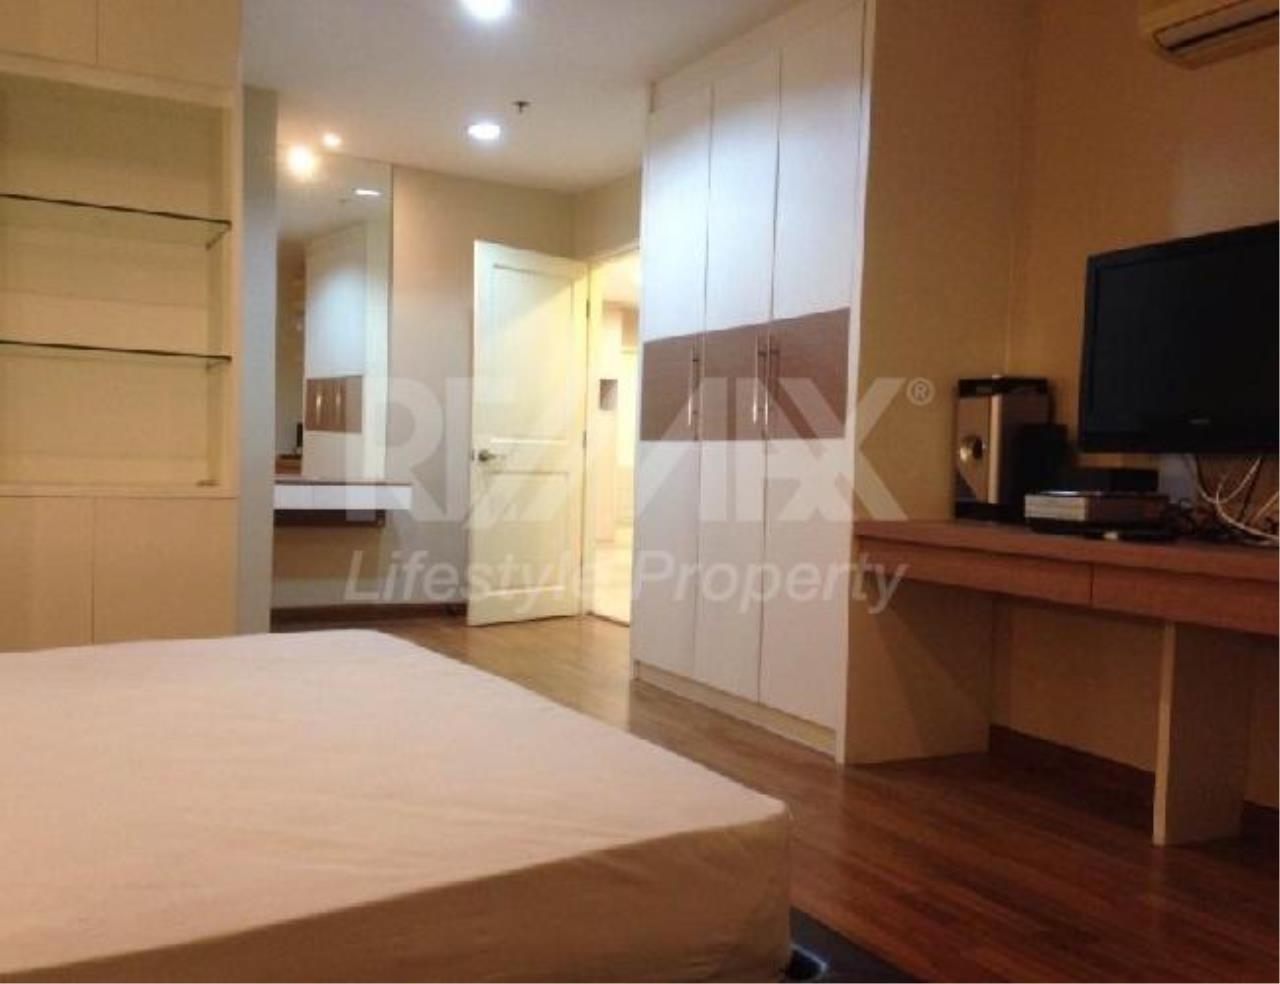 RE/MAX LifeStyle Property Agency's Serene Place Sukhumvit 24 5